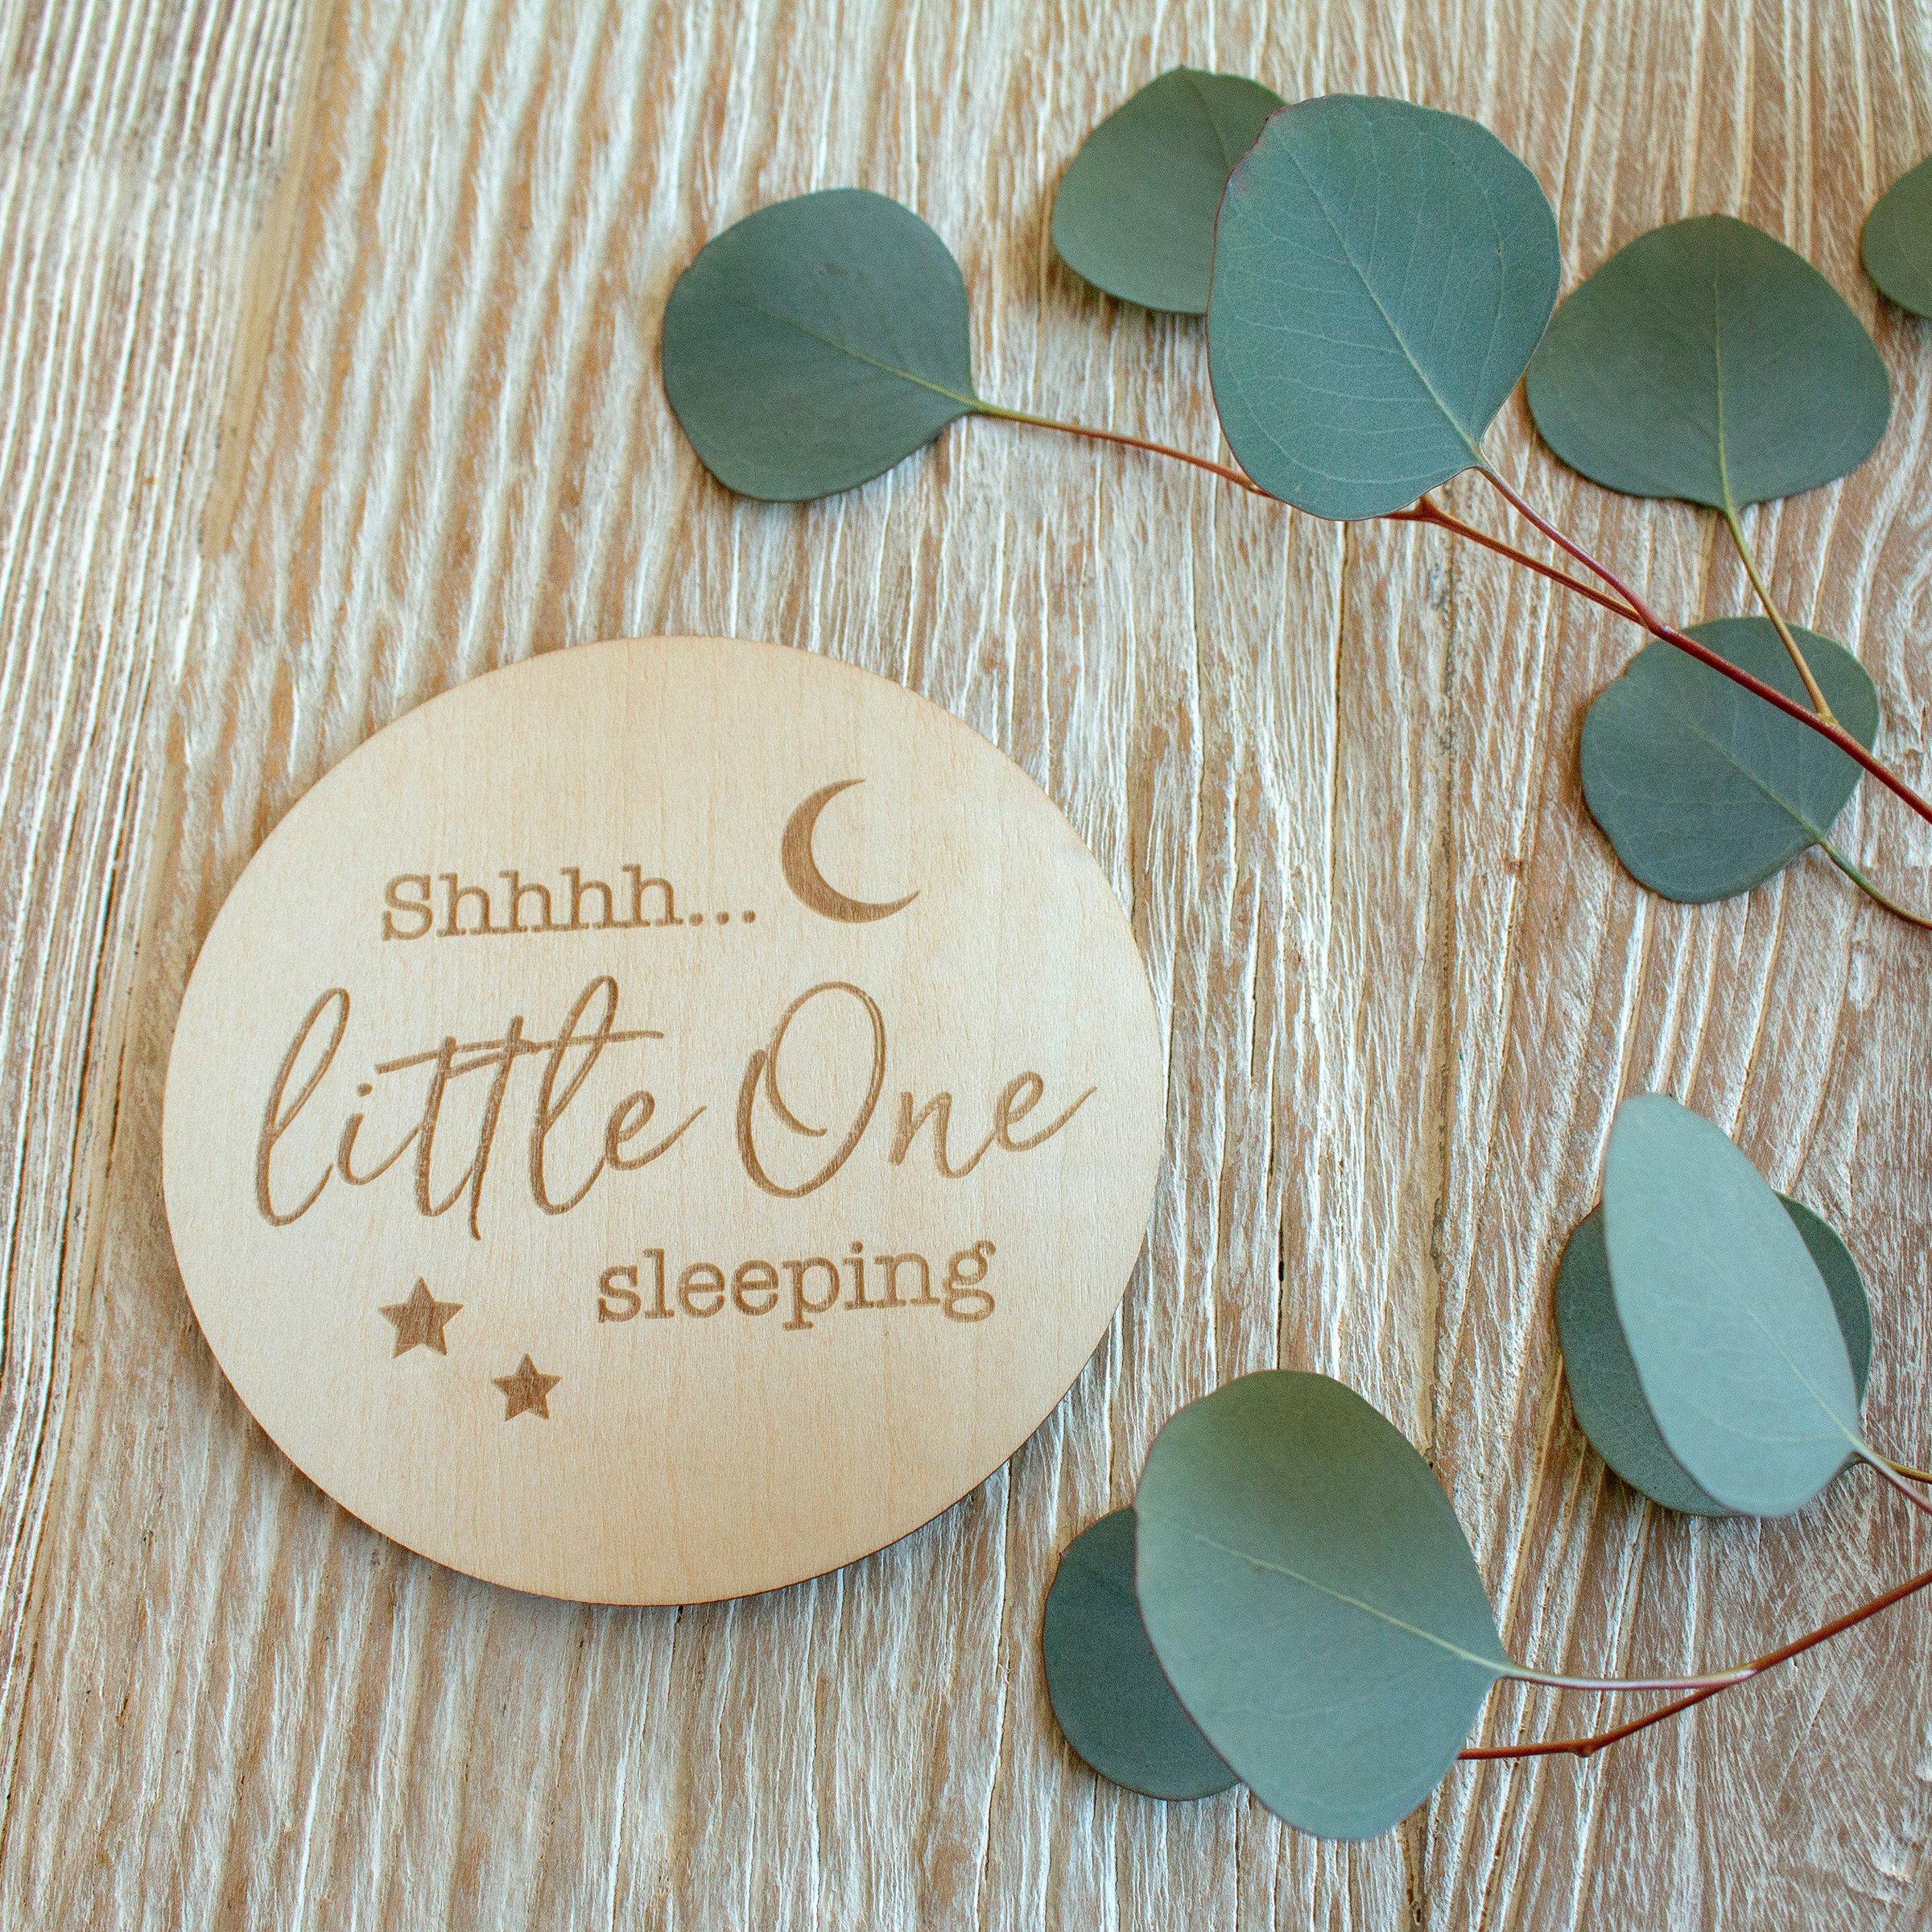 1pcs Little One Sleeping Milestone Disc wood signs